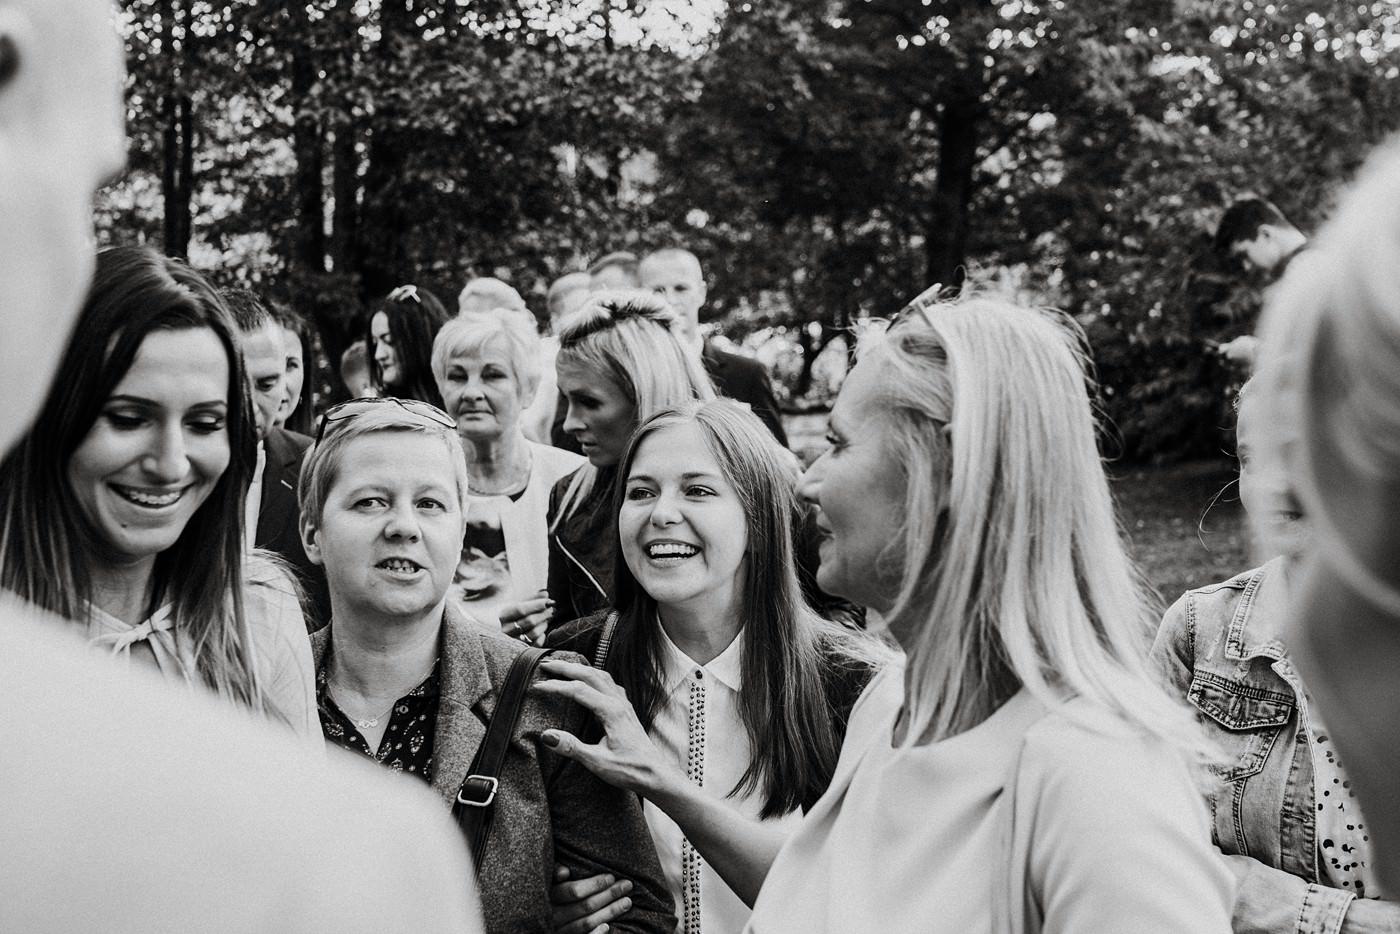 Martyna & Bartek - Wesele w Górach Sowich 55